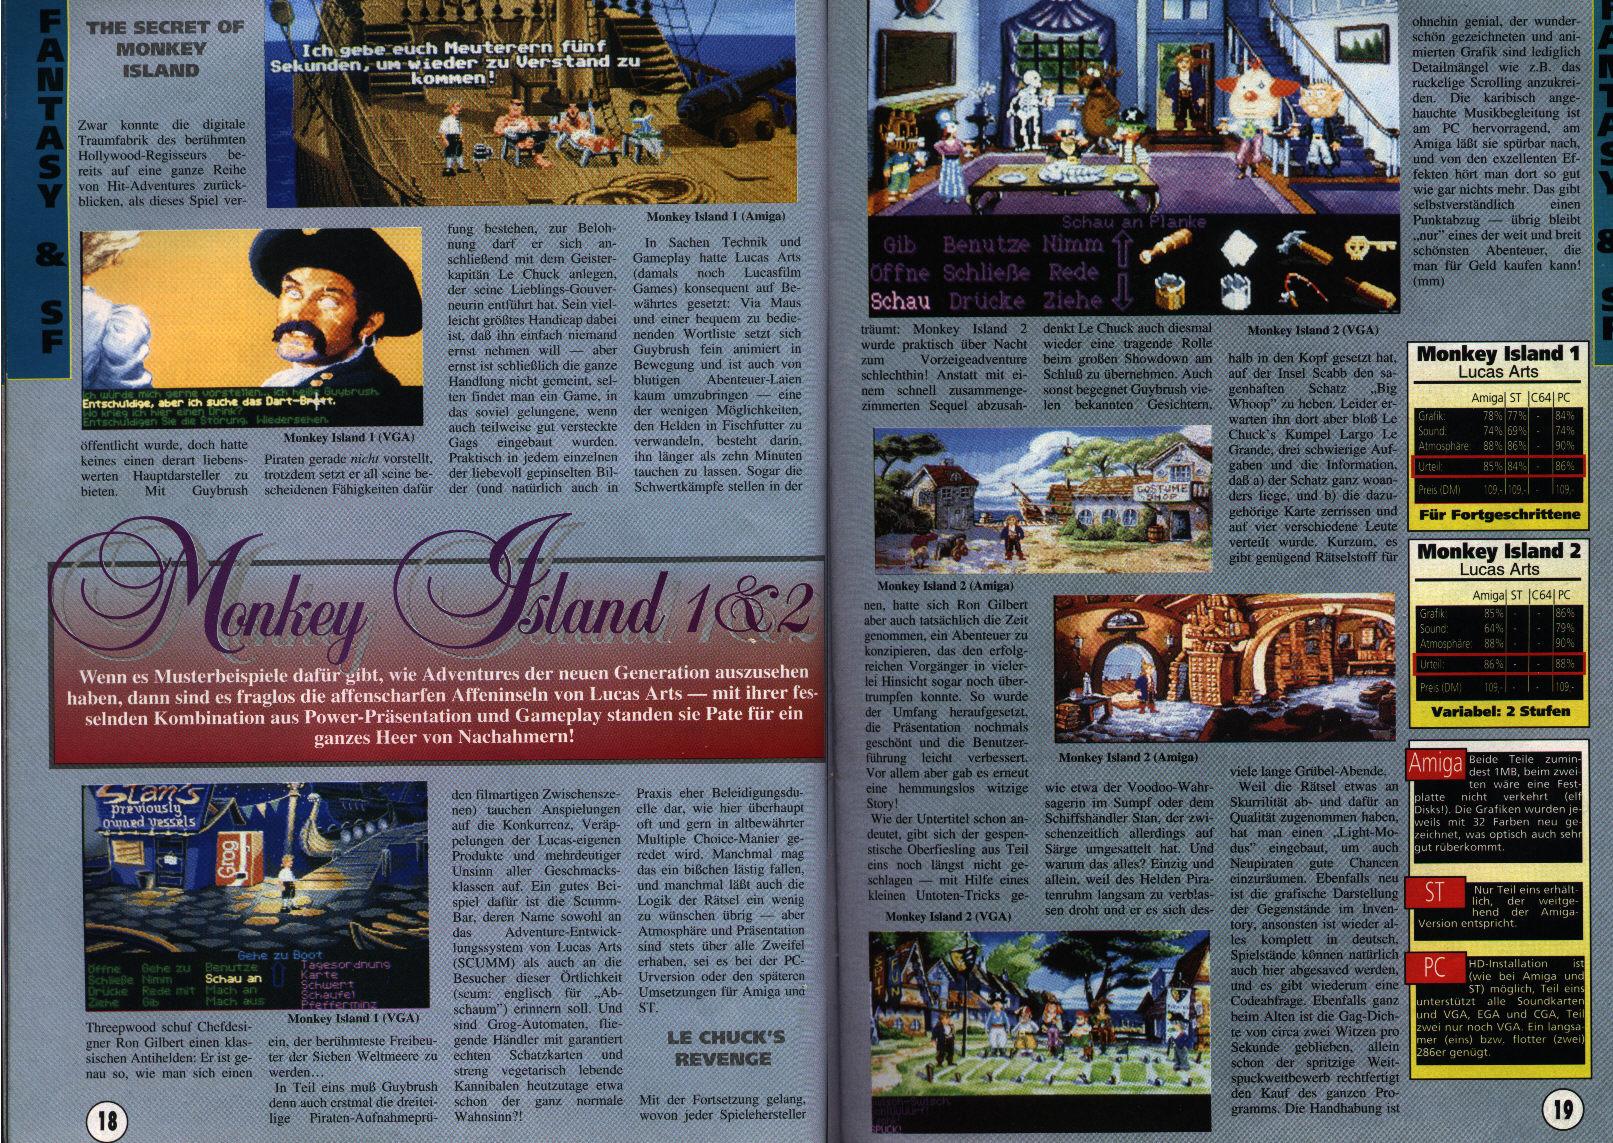 Monkey island 2 lechuck s revenge concept art the international - A Very German Monkey Island 1 2 Review